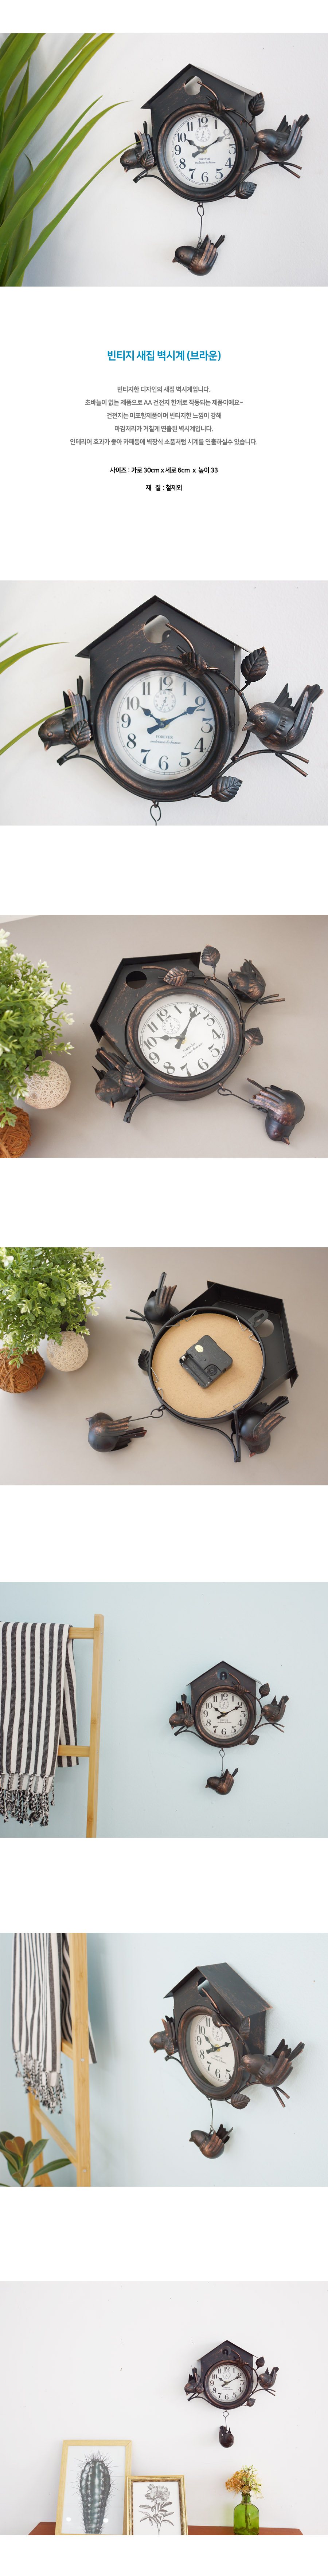 DS-S359빈티지 새집 벽시계 (브라운) 카페 소품 집들이 개업 선물 - 리빙톡톡, 58,000원, 벽시계, 디자인벽시계